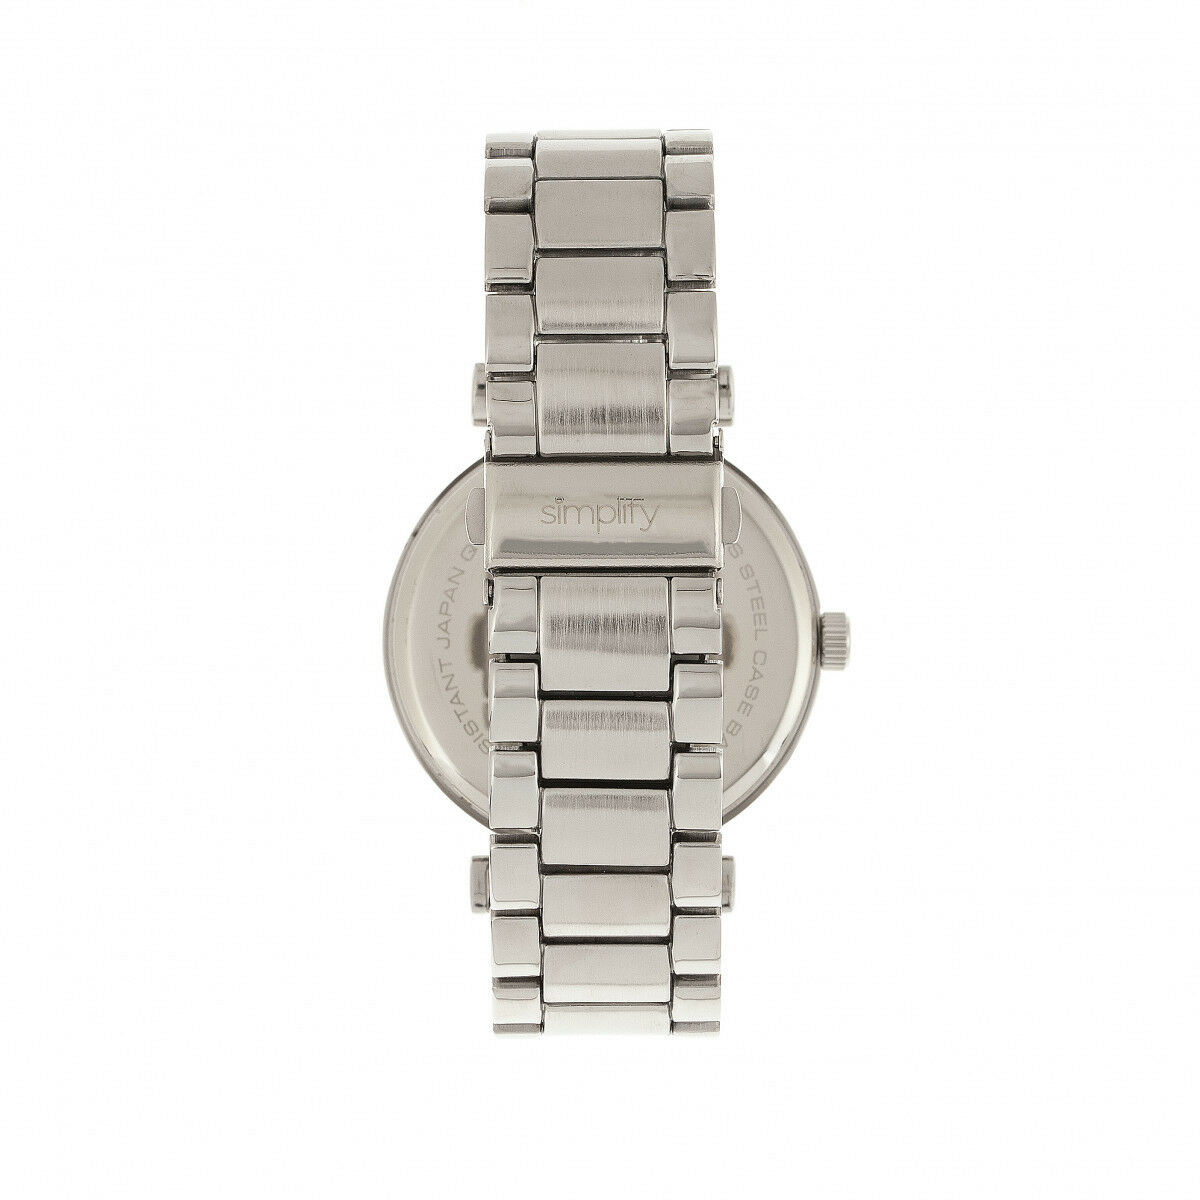 Armbanduhr Silbergrau Simplify Simplify Silbergrau Sim4803 Simplify Sim4803 Sim4803 Simplify Armbanduhr Silbergrau Armbanduhr 54S3qALjcR